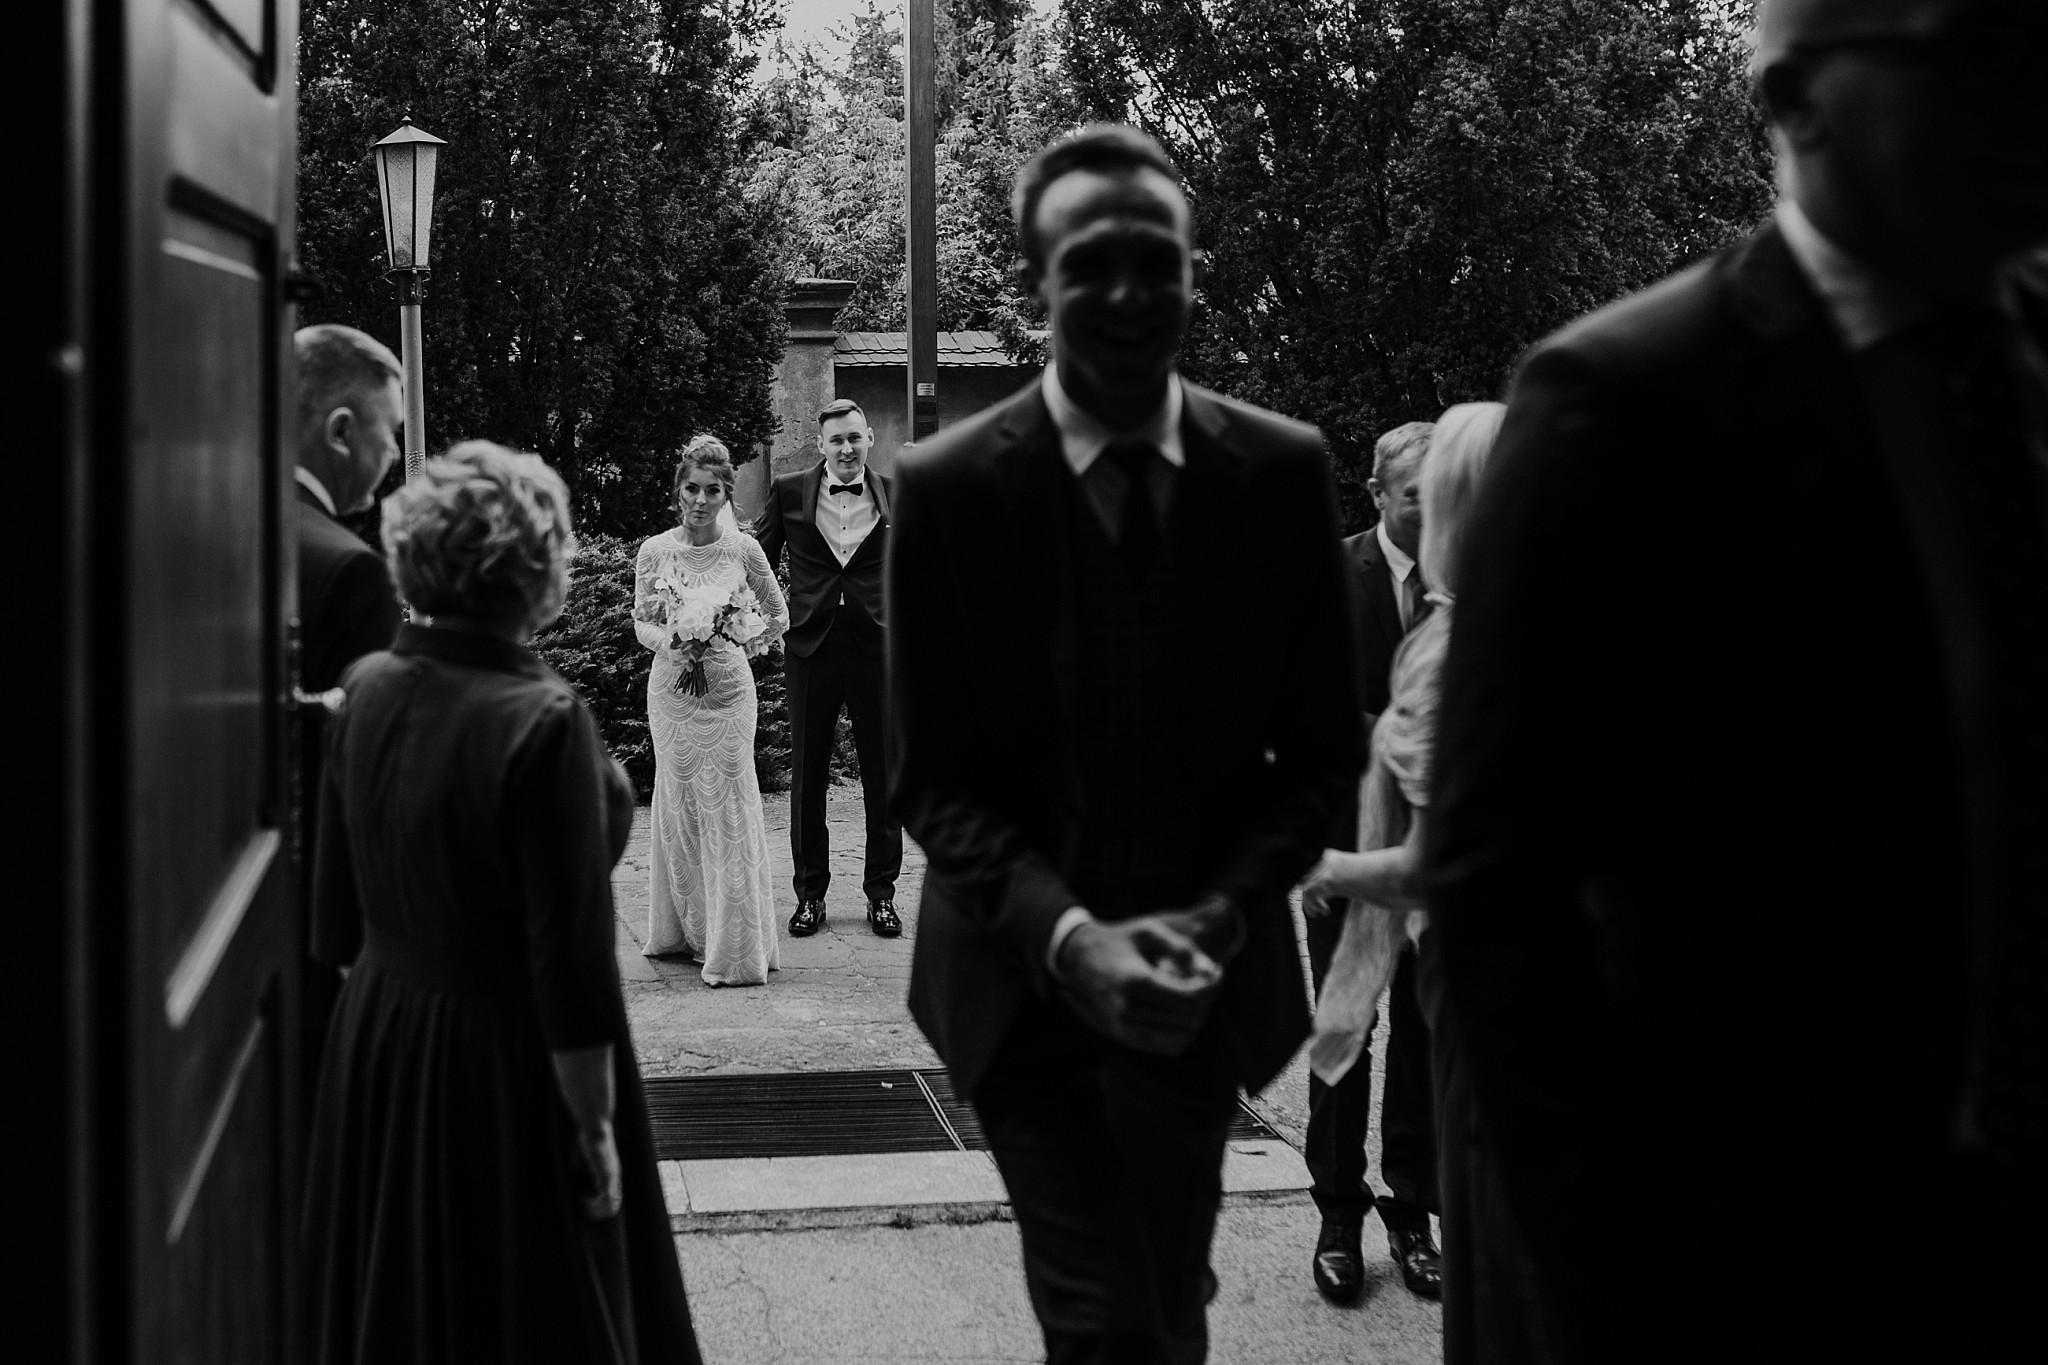 fotograf poznan wesele dobra truskawka piekne wesele pod poznaniem wesele w dobrej truskawce piekna para mloda slub marzen slub koronawirus slub listopad wesele koronawirus 137